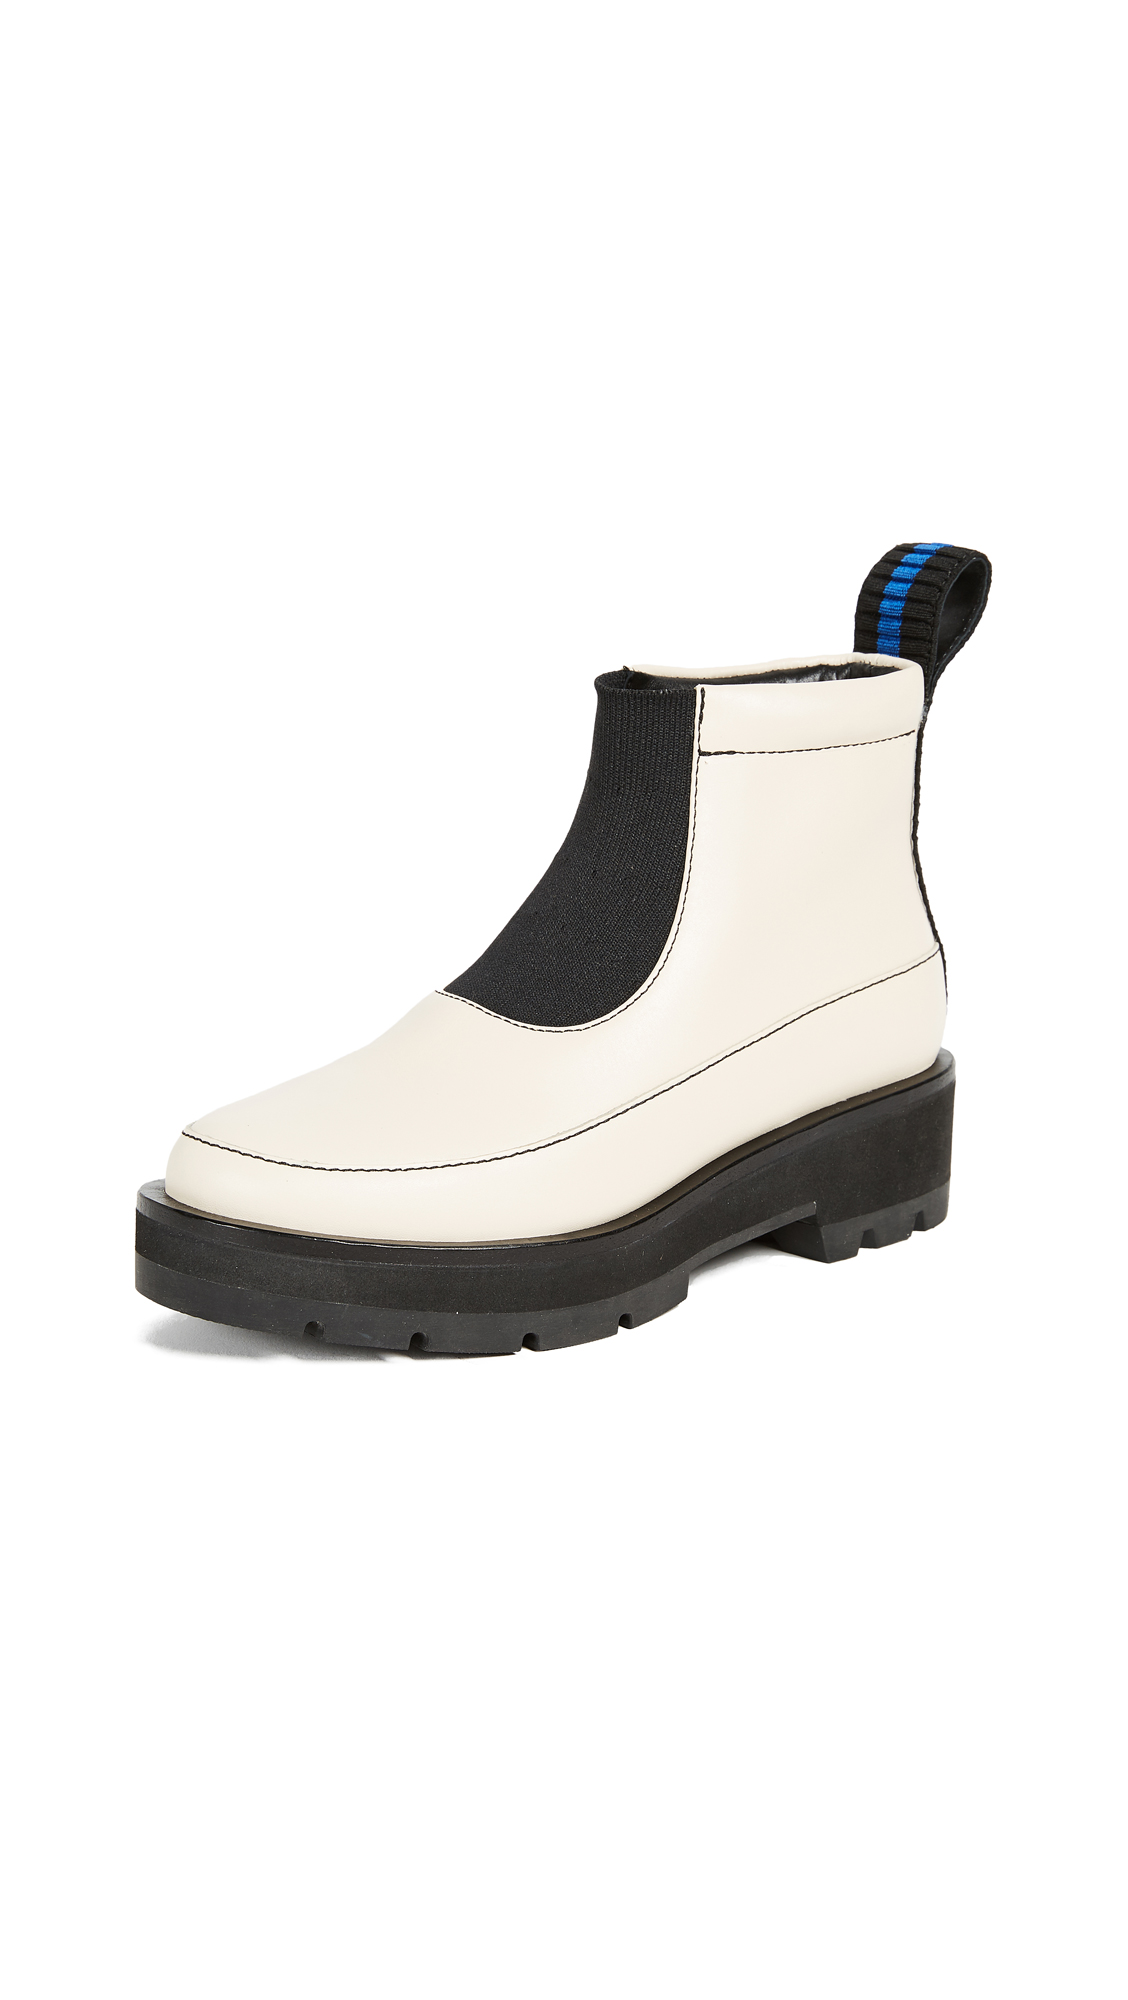 3.1 Phillip Lim Avril Boots - Vanilla